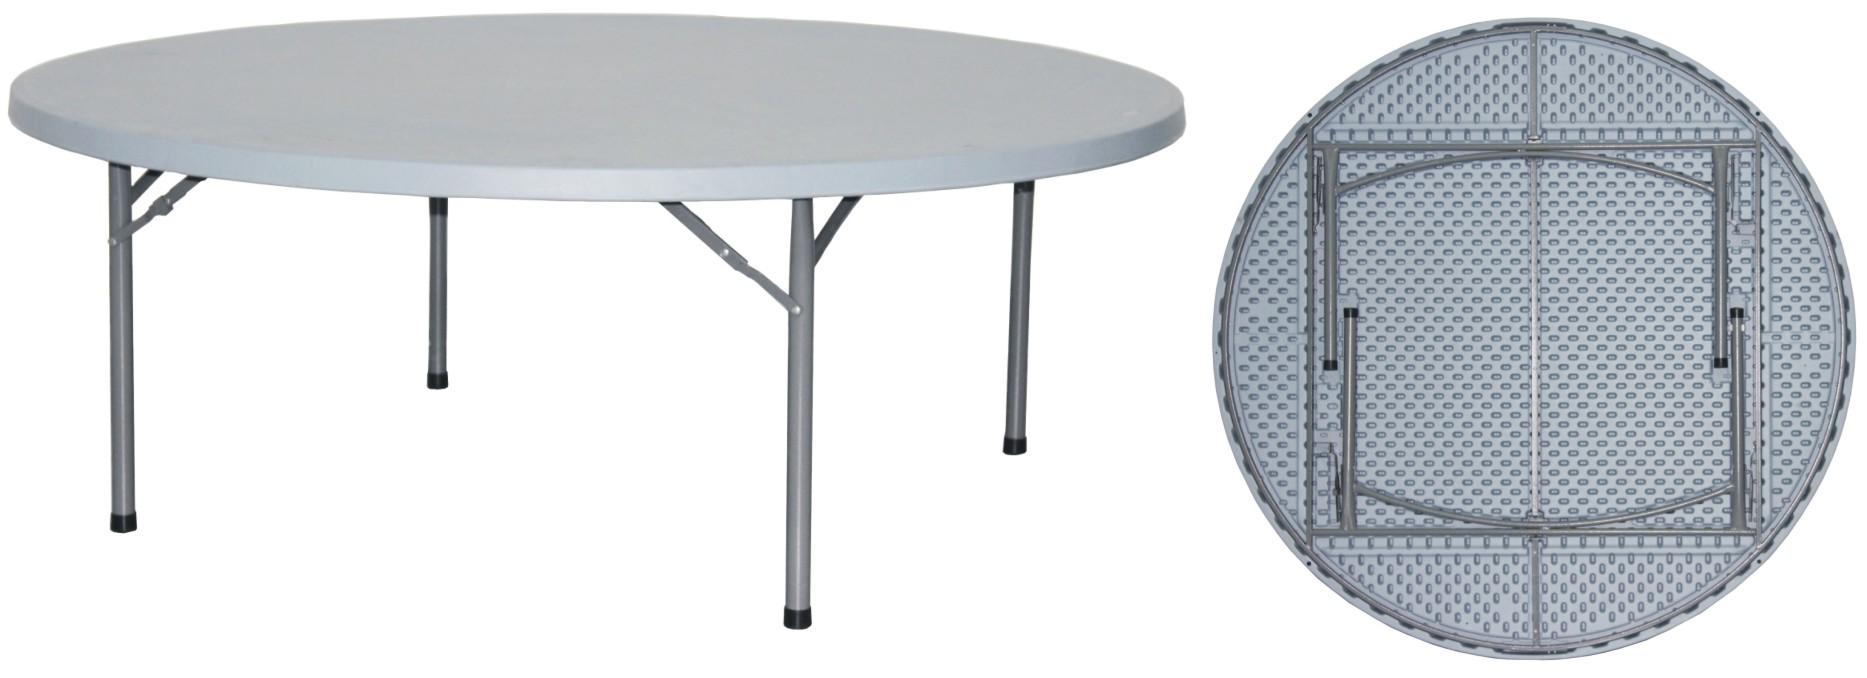 Venta de mesas plegables para eventos catering for Mesa plegable redonda